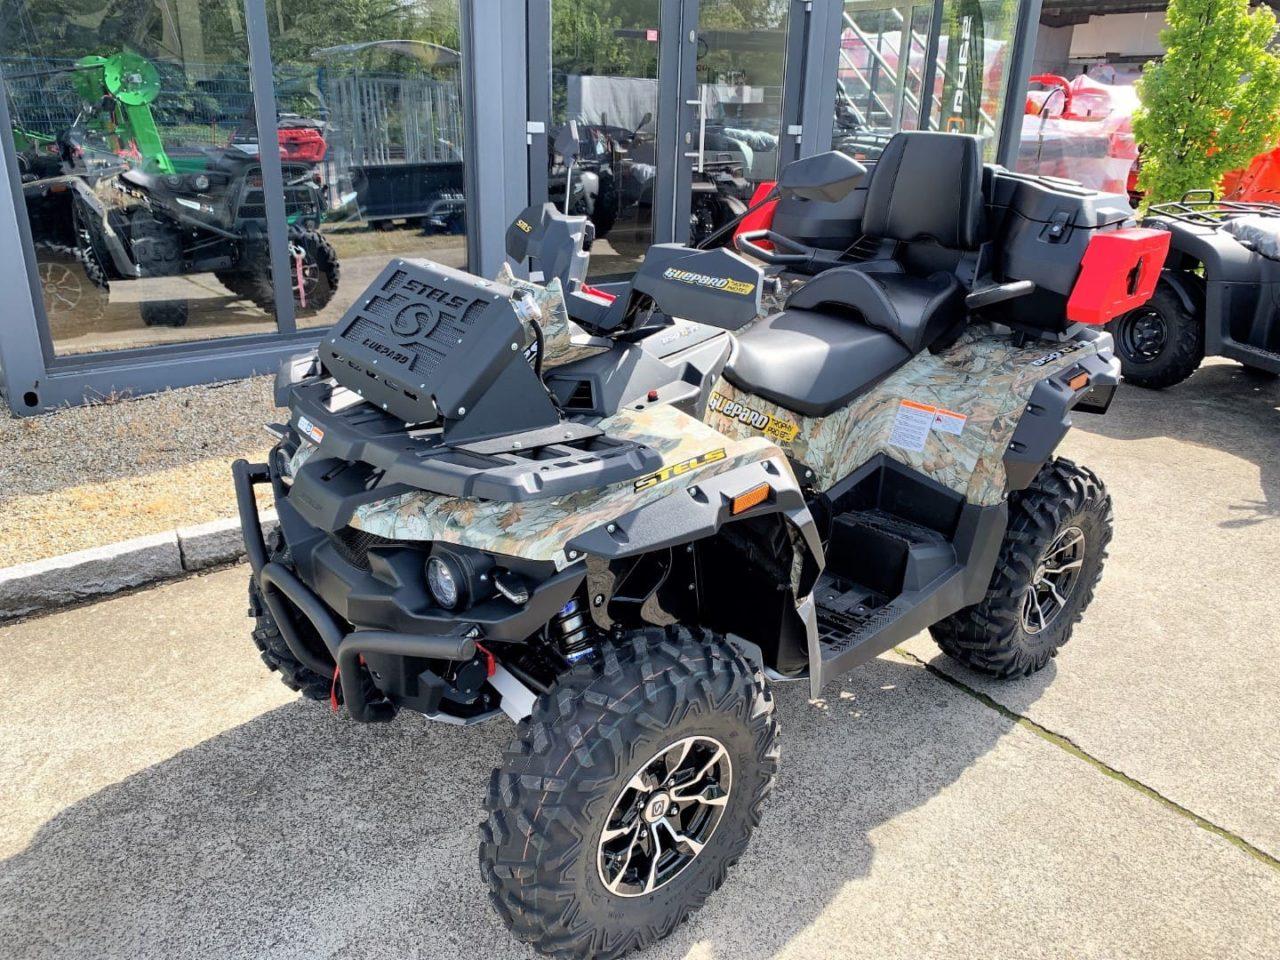 ATV / Quad Stels Guepard 850 G, 68 PS, 850 ccm, LOF Zulassung